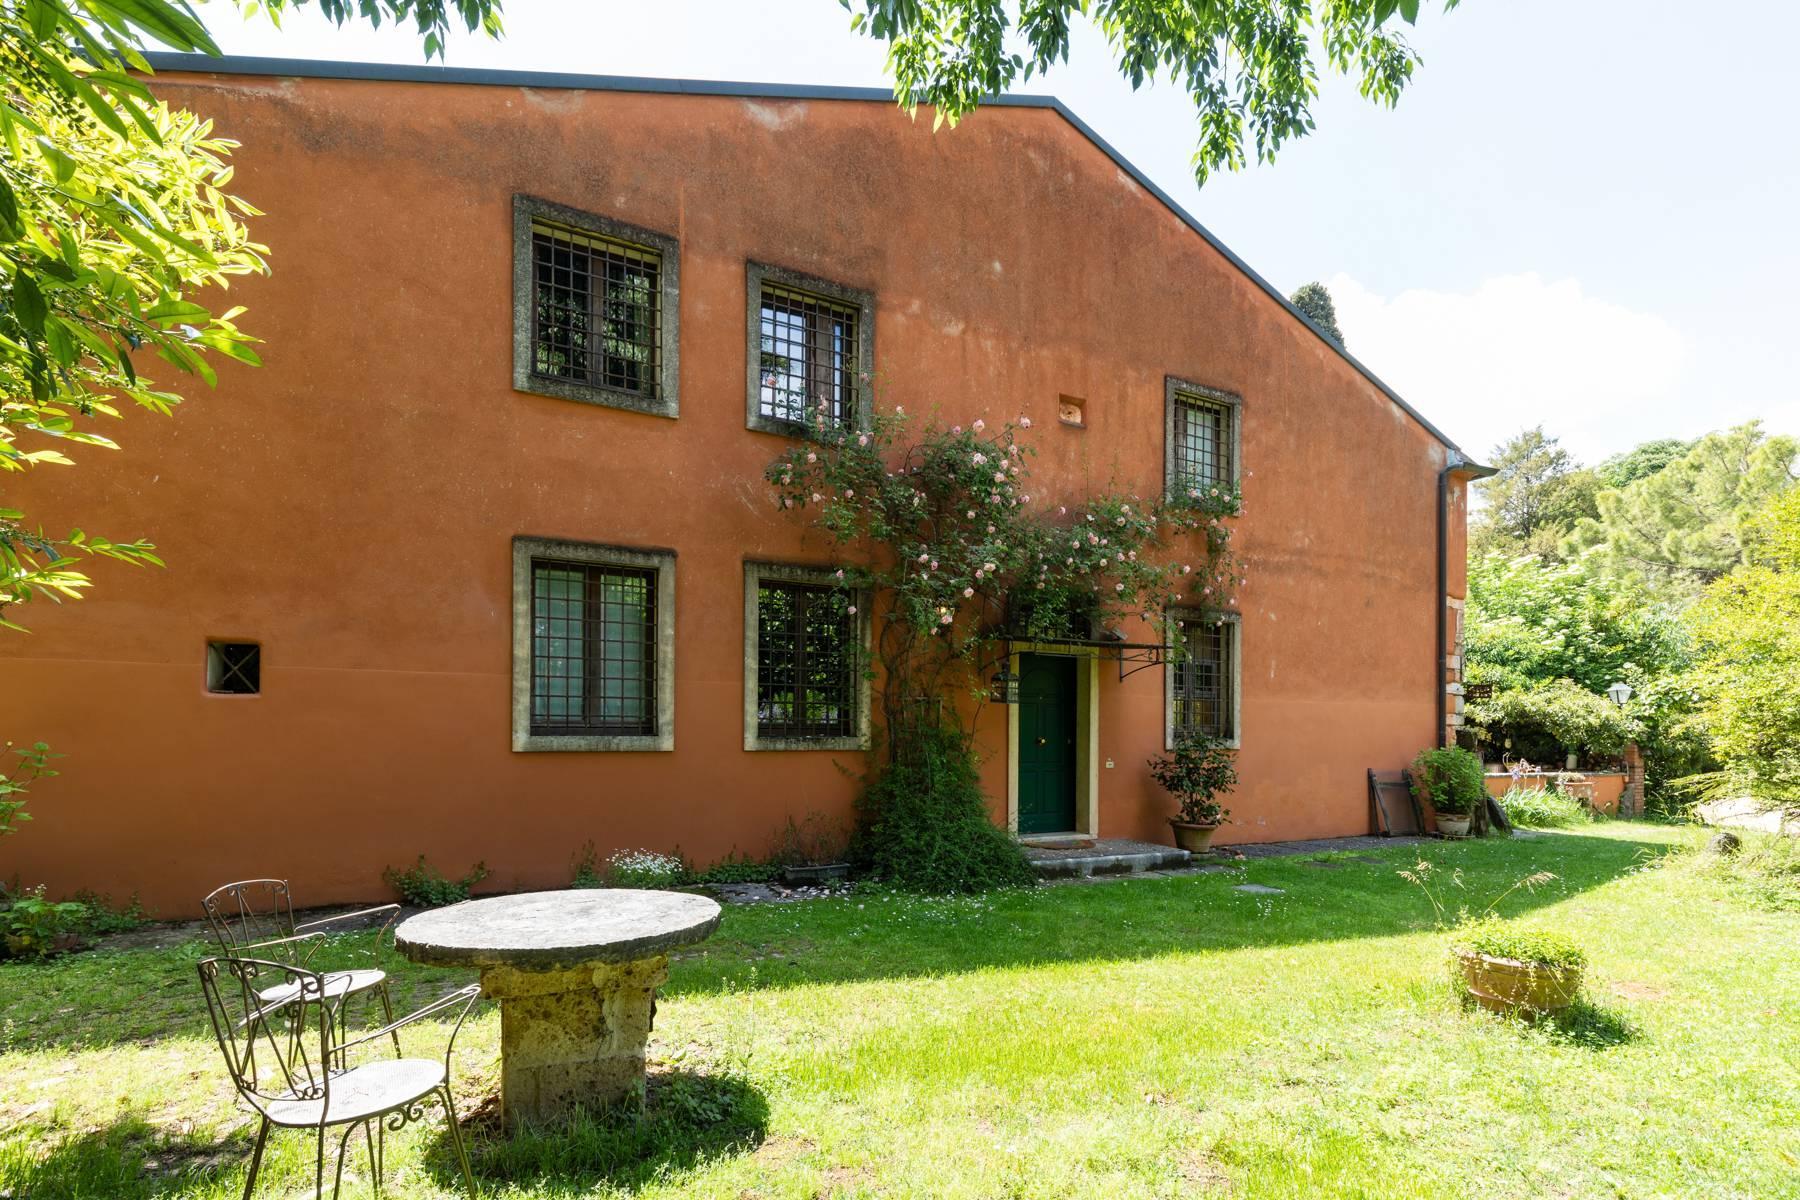 Affascinante villa Veneta a pochi minuti da Verona - 48